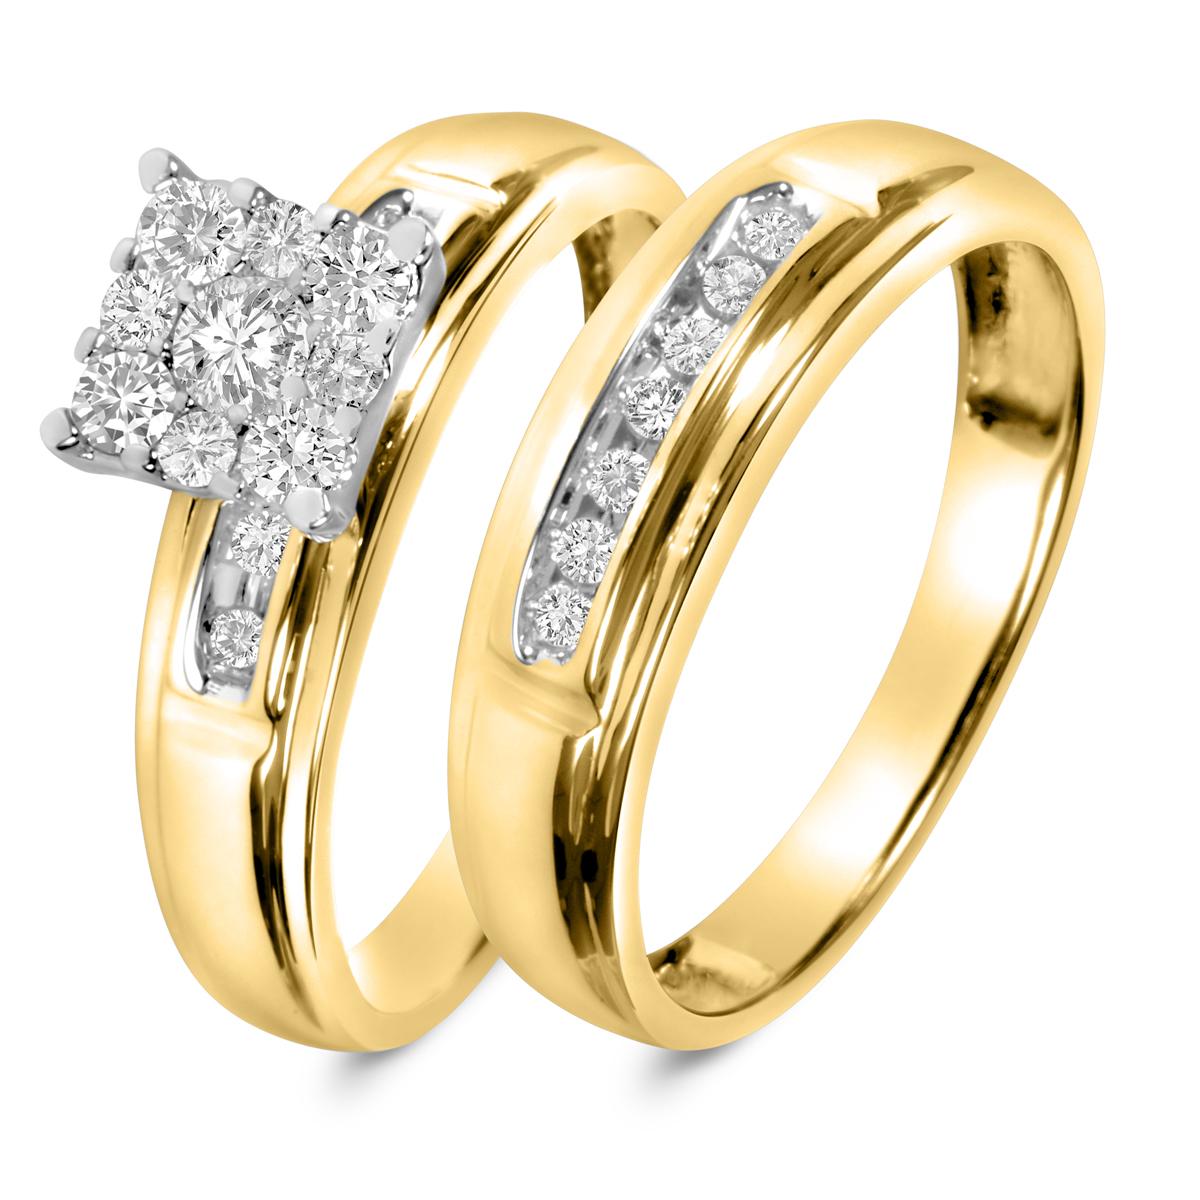 1/2 CT. T.W. Round Cut Diamond Ladies Bridal Wedding Ring Set 10K Yellow Gold